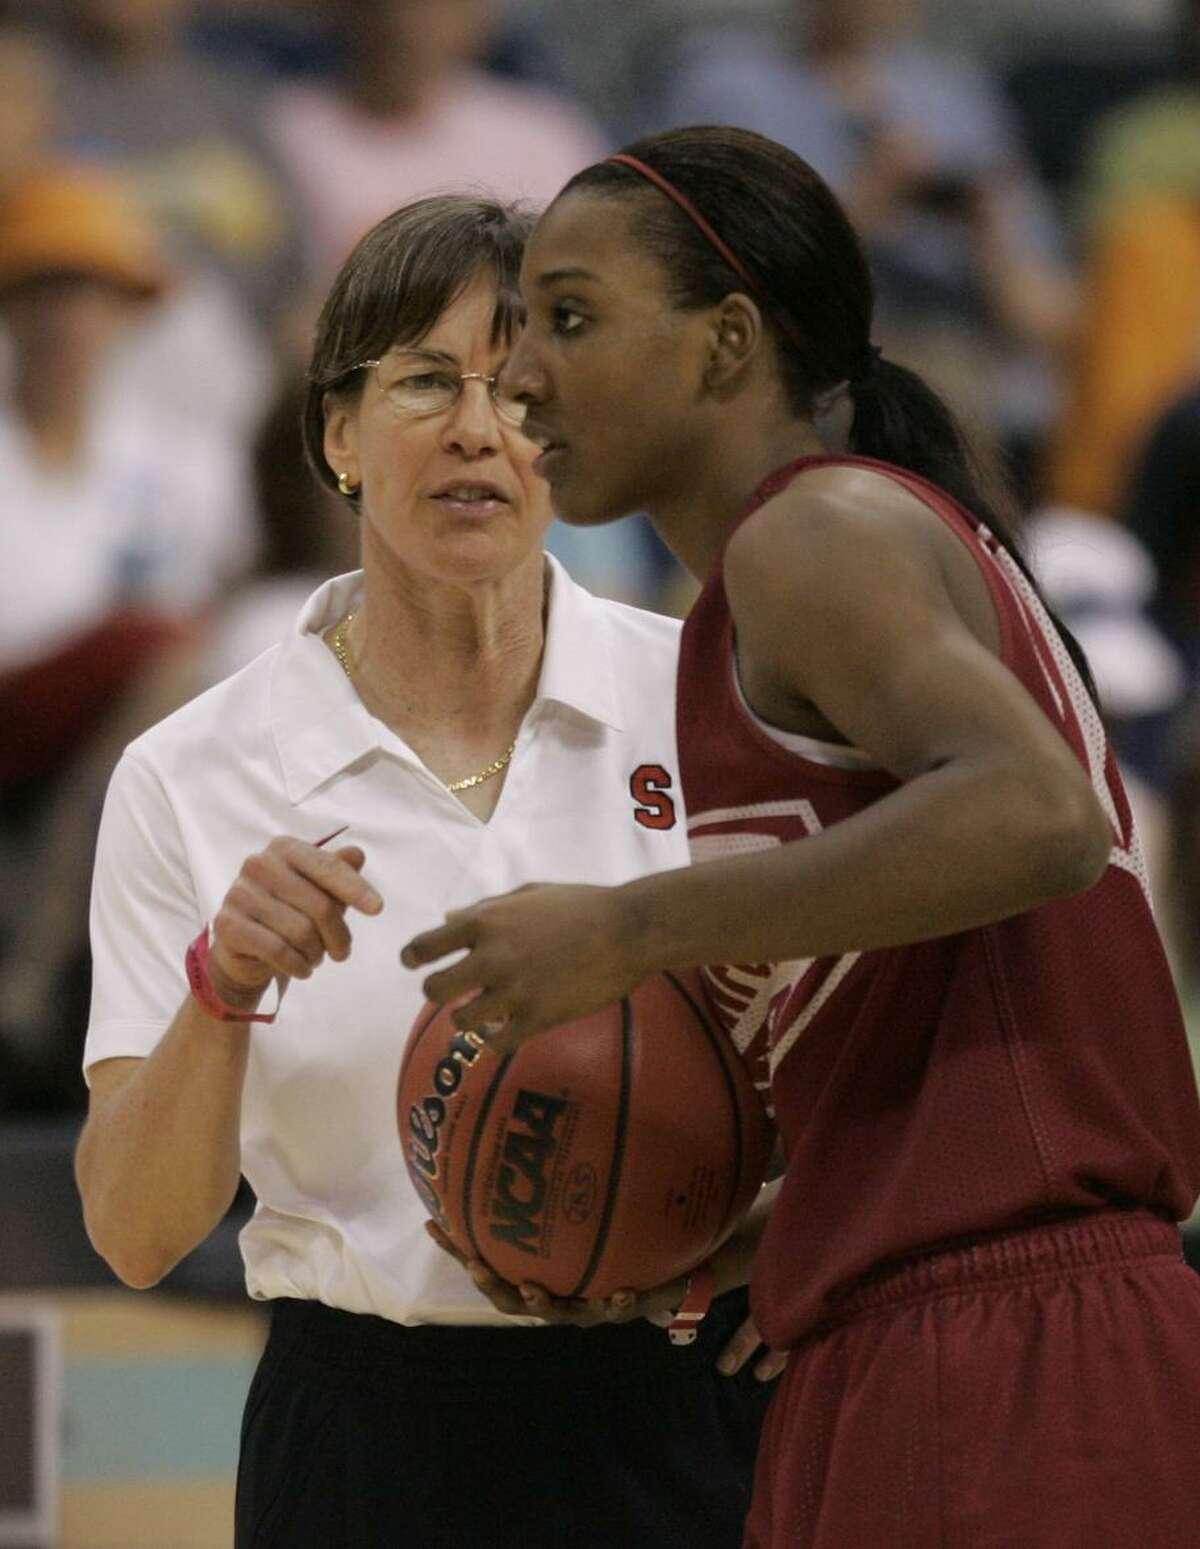 Tara VanDerveer, Candice Wiggins' coach a decade ago, said the ex-Cardinal's assessment of WNBA players' sexual orientation